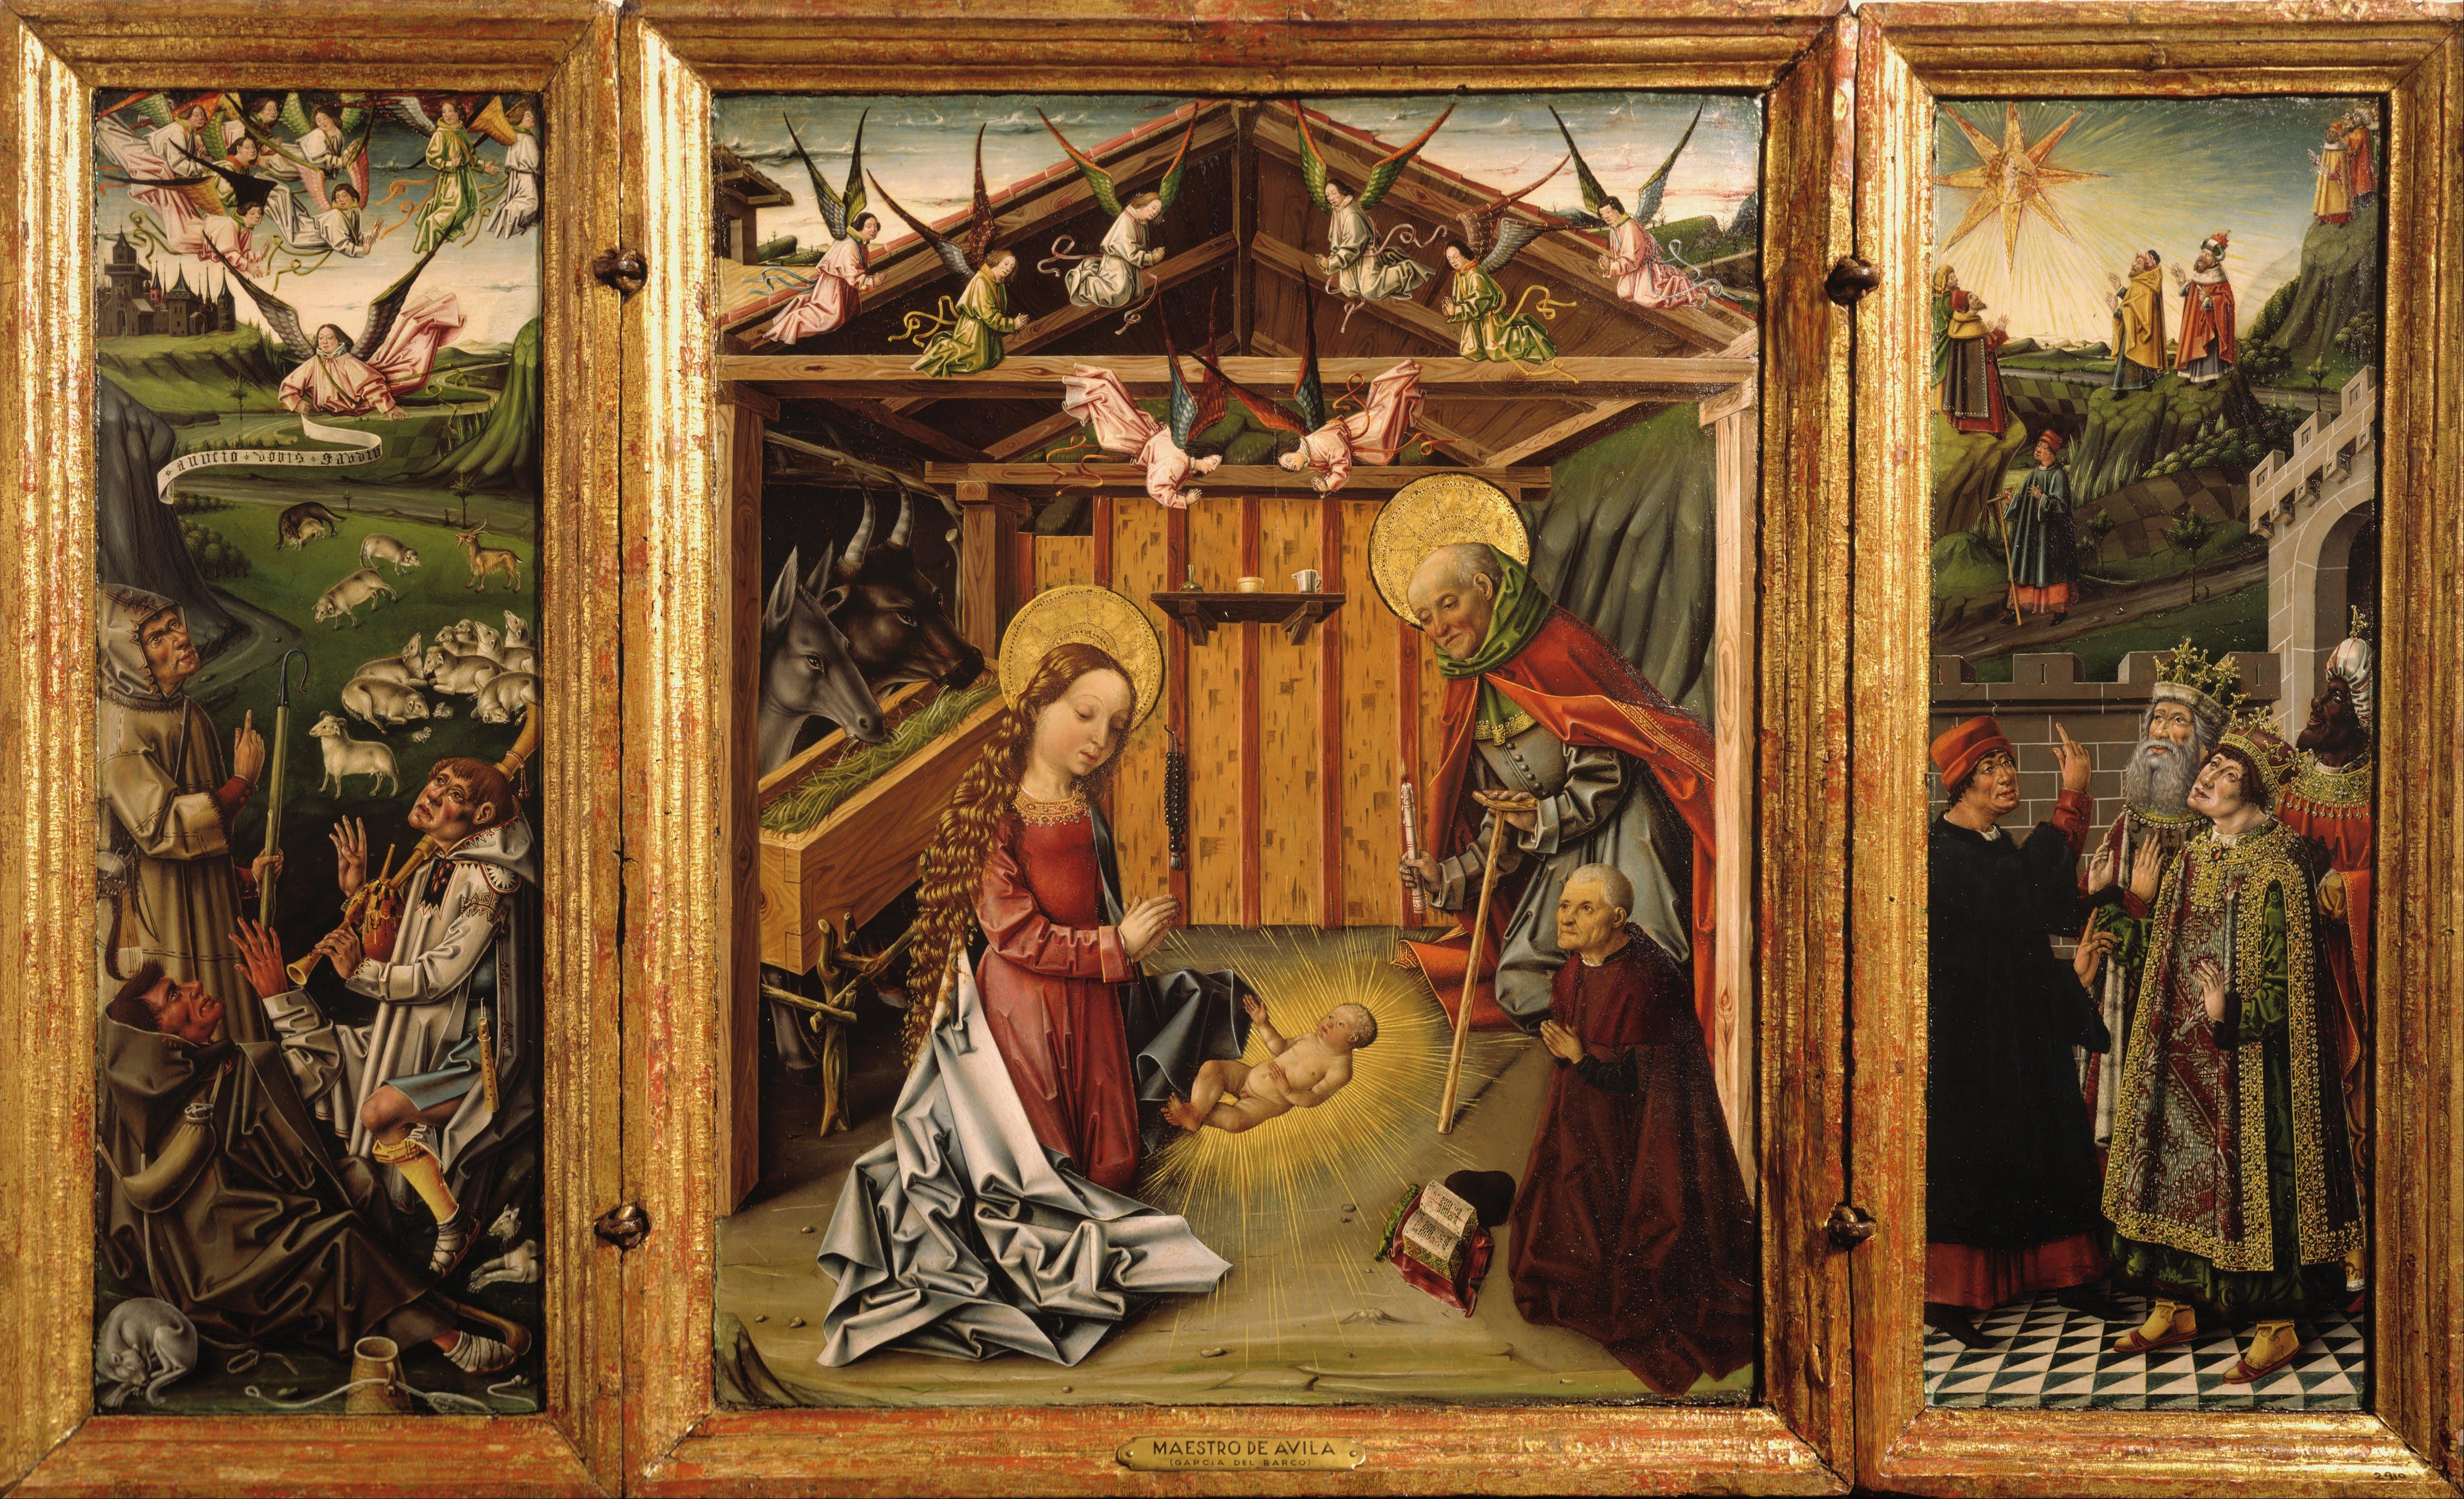 File:García del Barco - Triptych of the Nativity - Google Art Project.jpg - W...